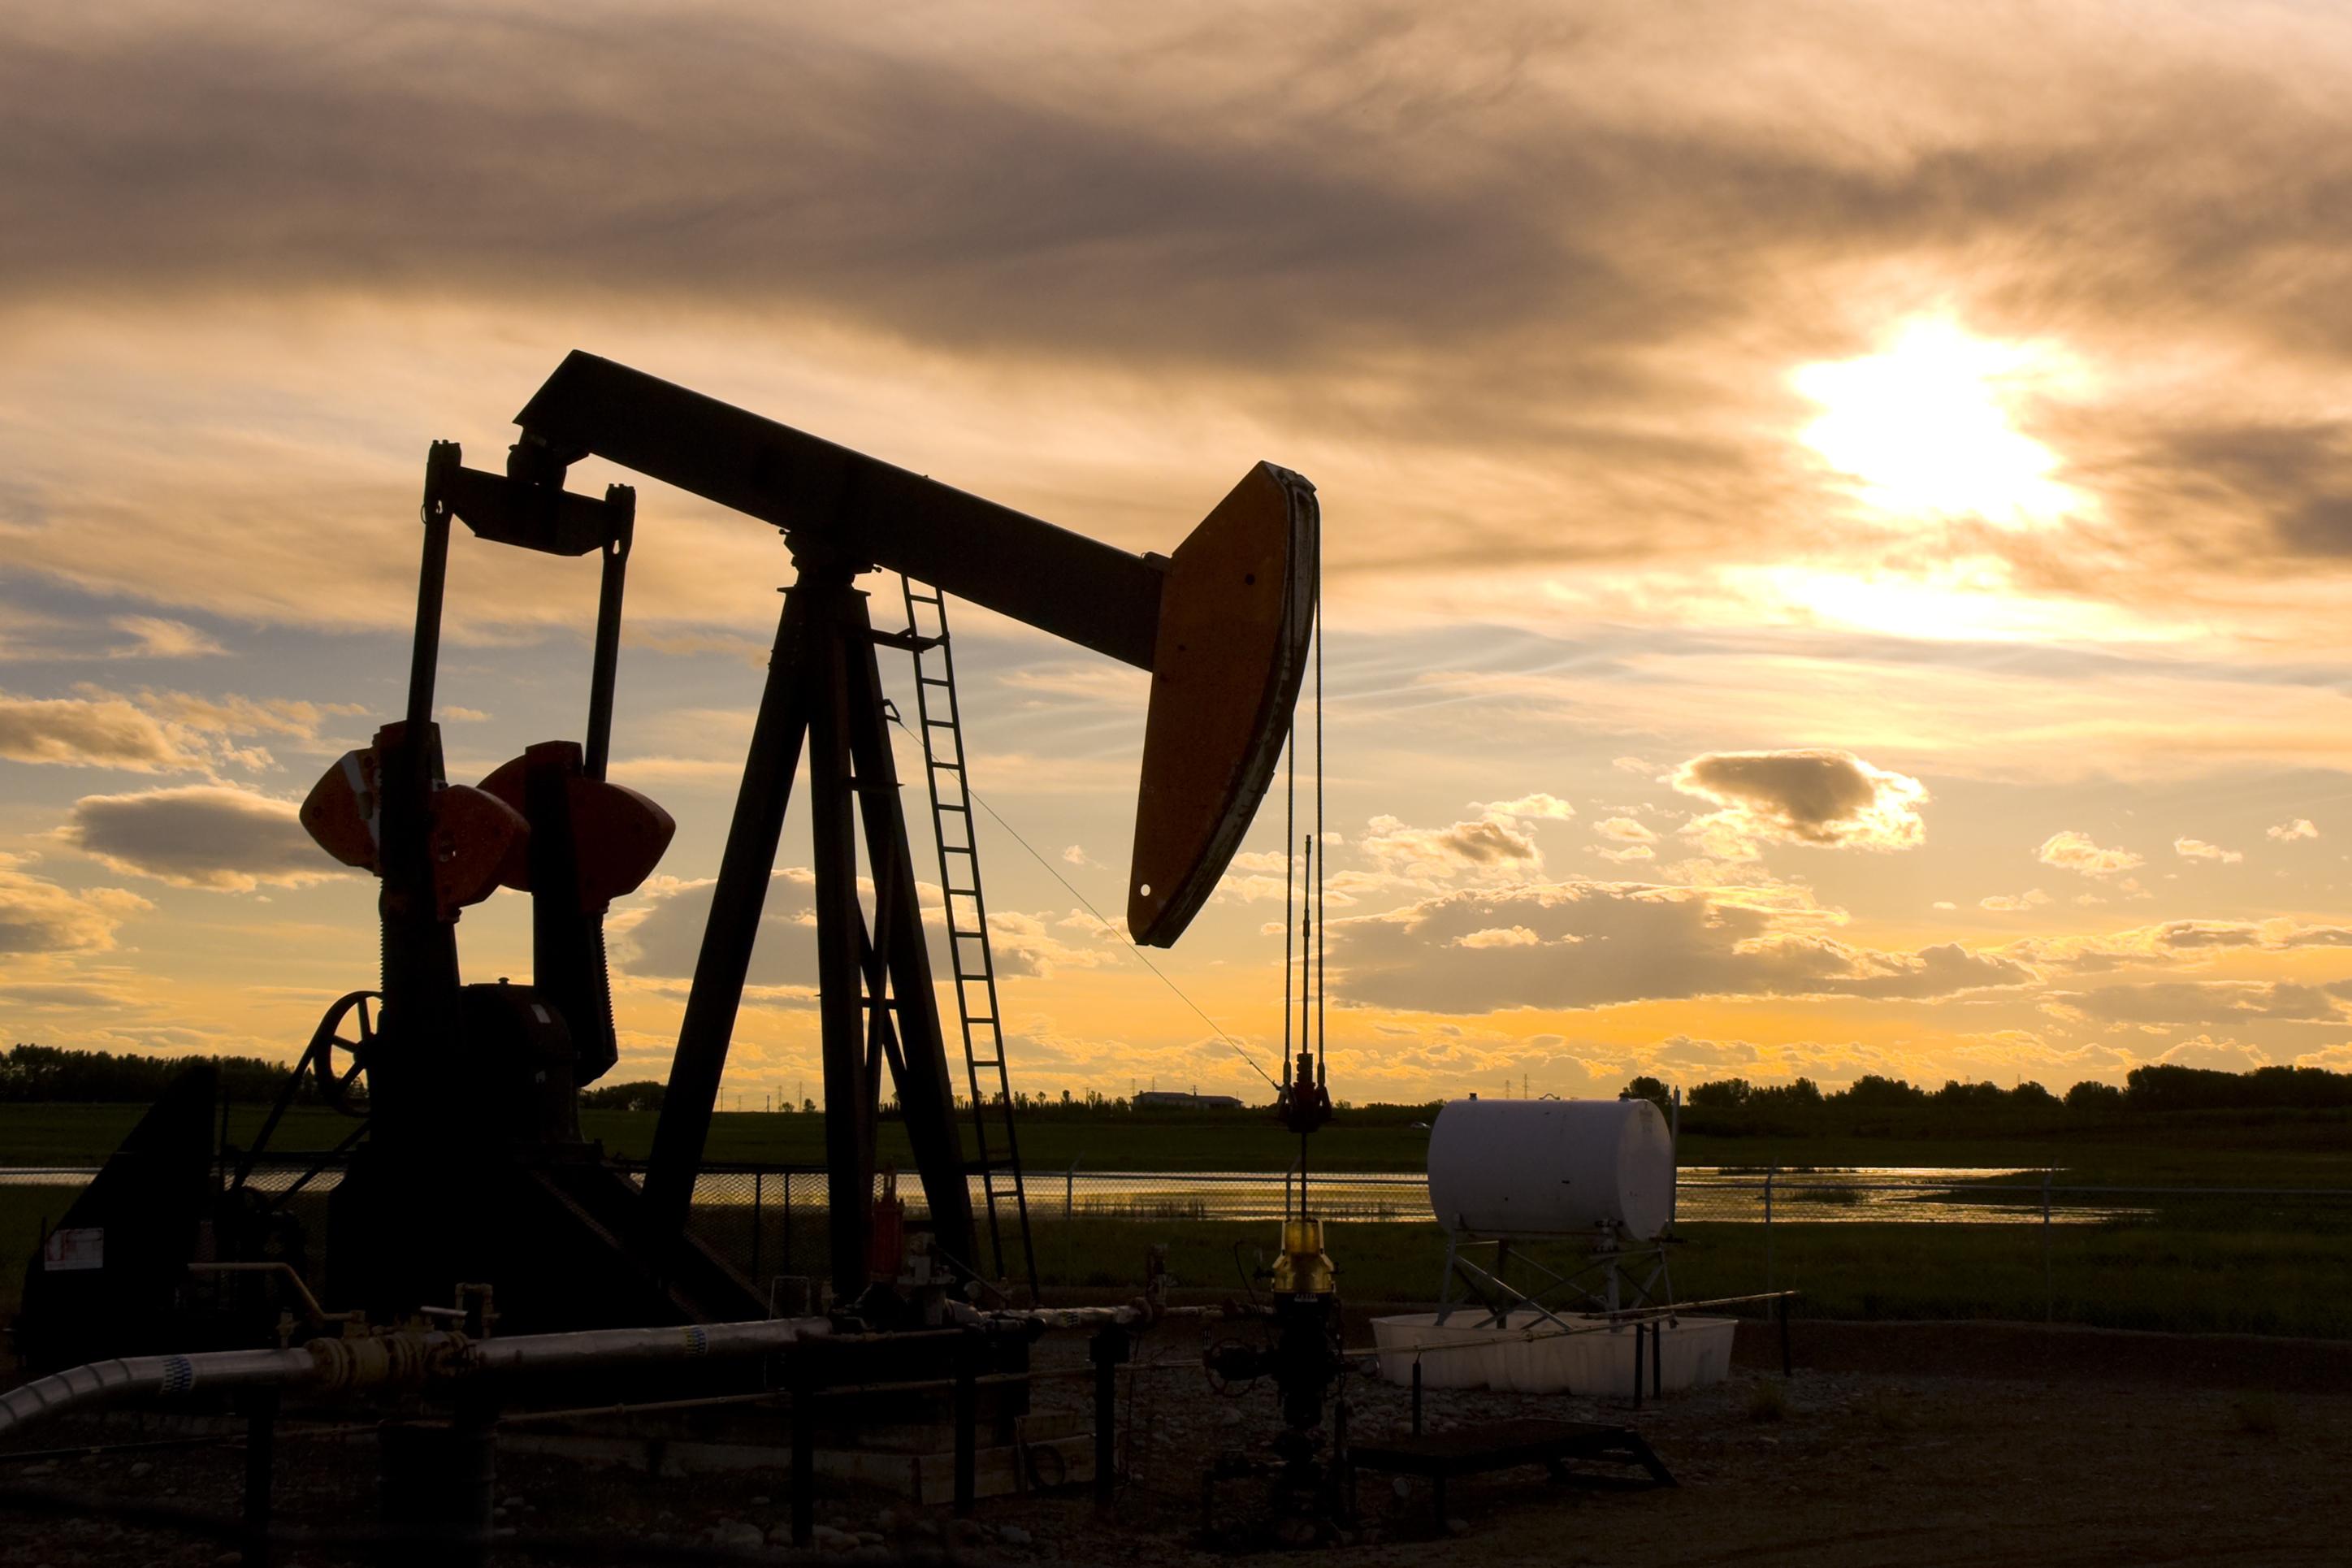 Oil pumpjack against setting sun